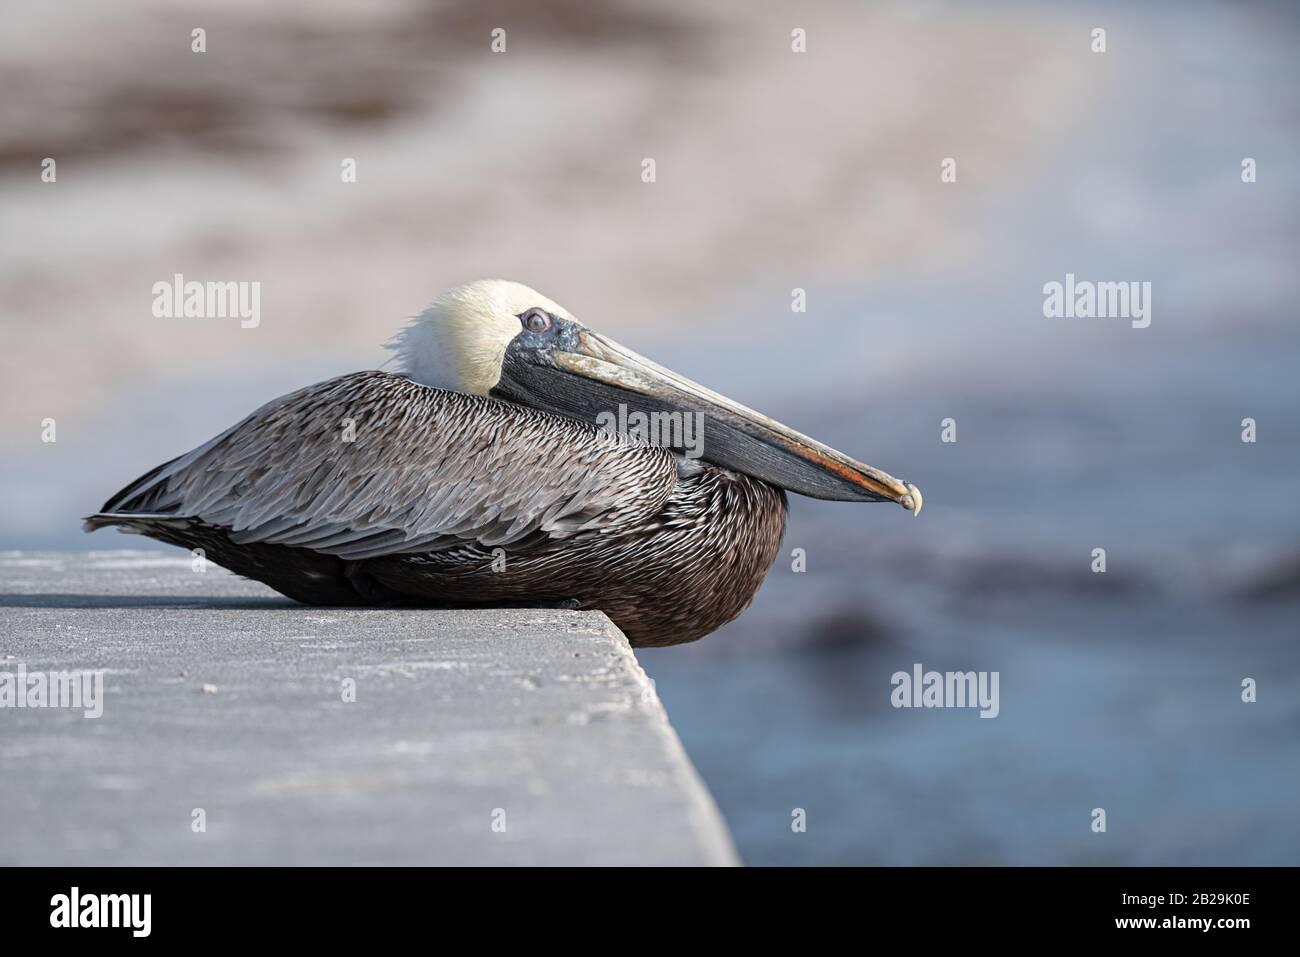 Sleepy Grey Pelican Stock Photo